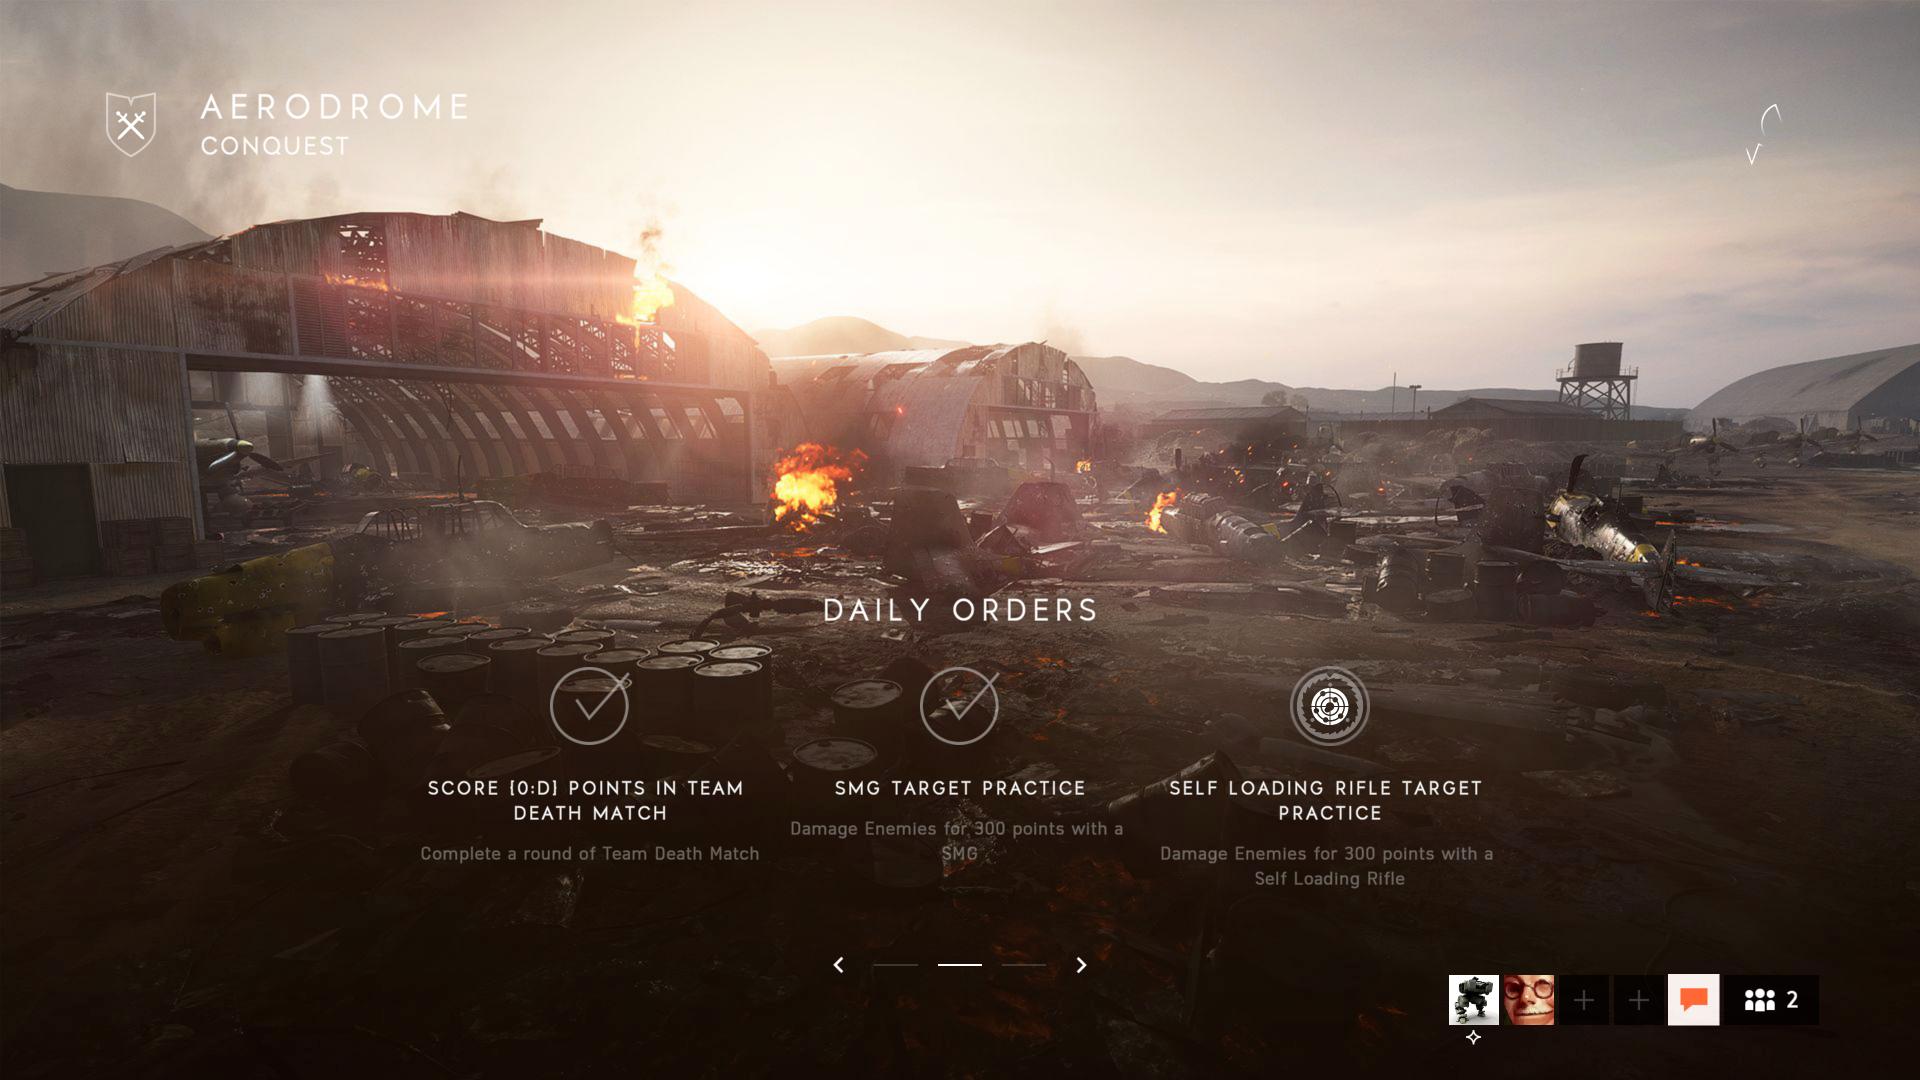 1795814633_BattlefieldVScreenshot2018_11.15-17_30_08_54.thumb.png.aa5f5d7e9becbef97ff88955233f94e7.png